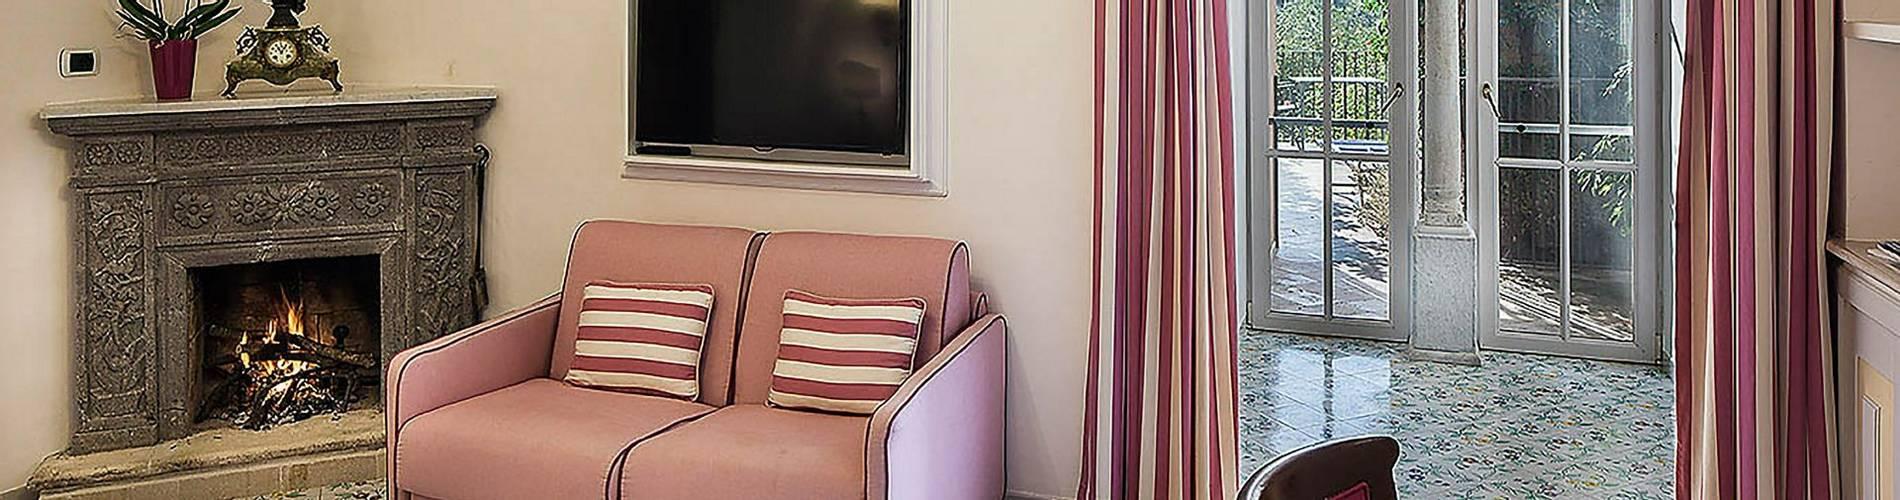 Villa Maria, Amalfi Coast, Italy, sup.jpg